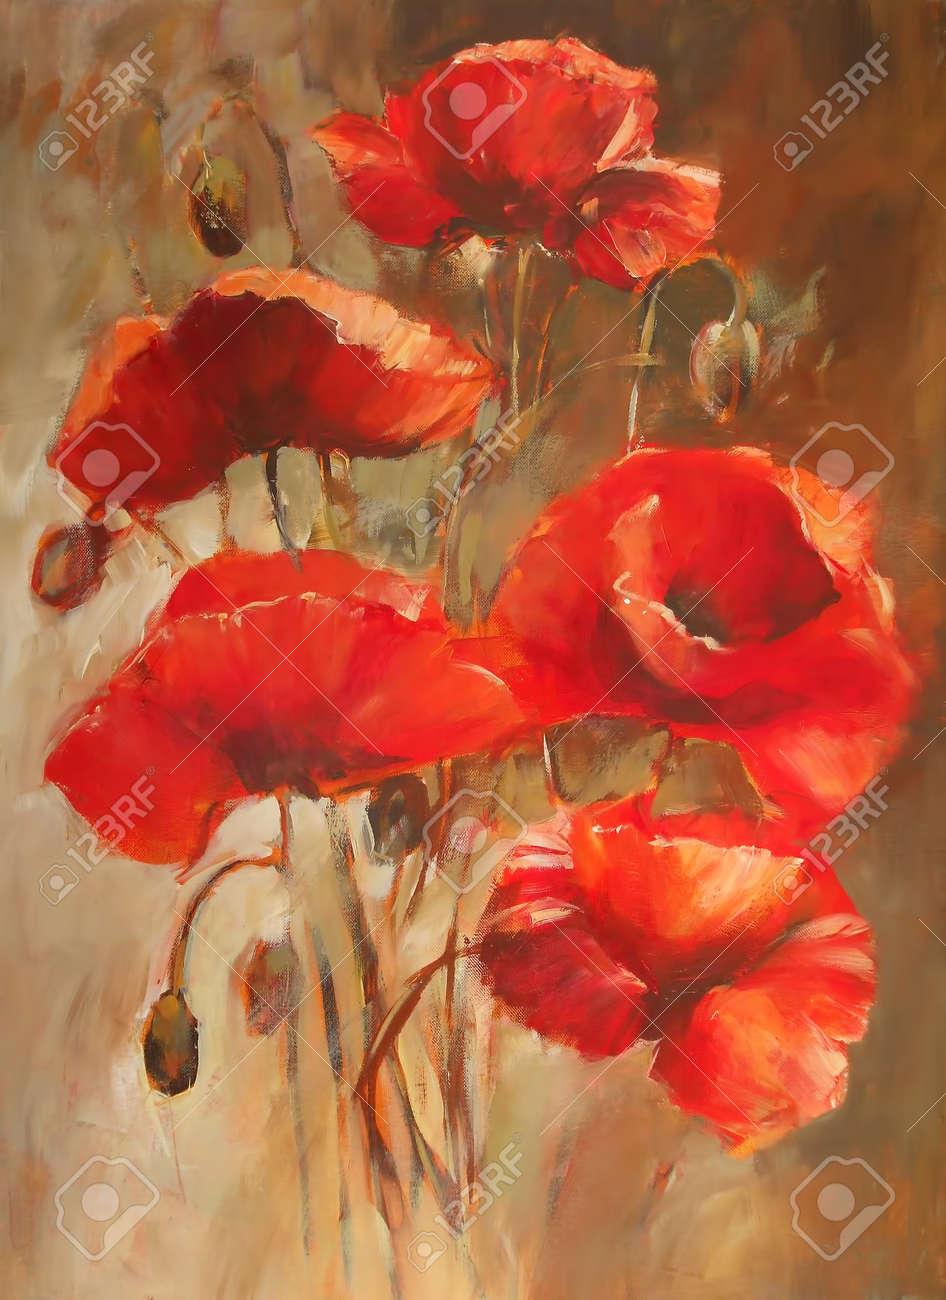 Poppy flowers handmade oil painting on canvas stock photo picture poppy flowers handmade oil painting on canvas stock photo 55509850 mightylinksfo